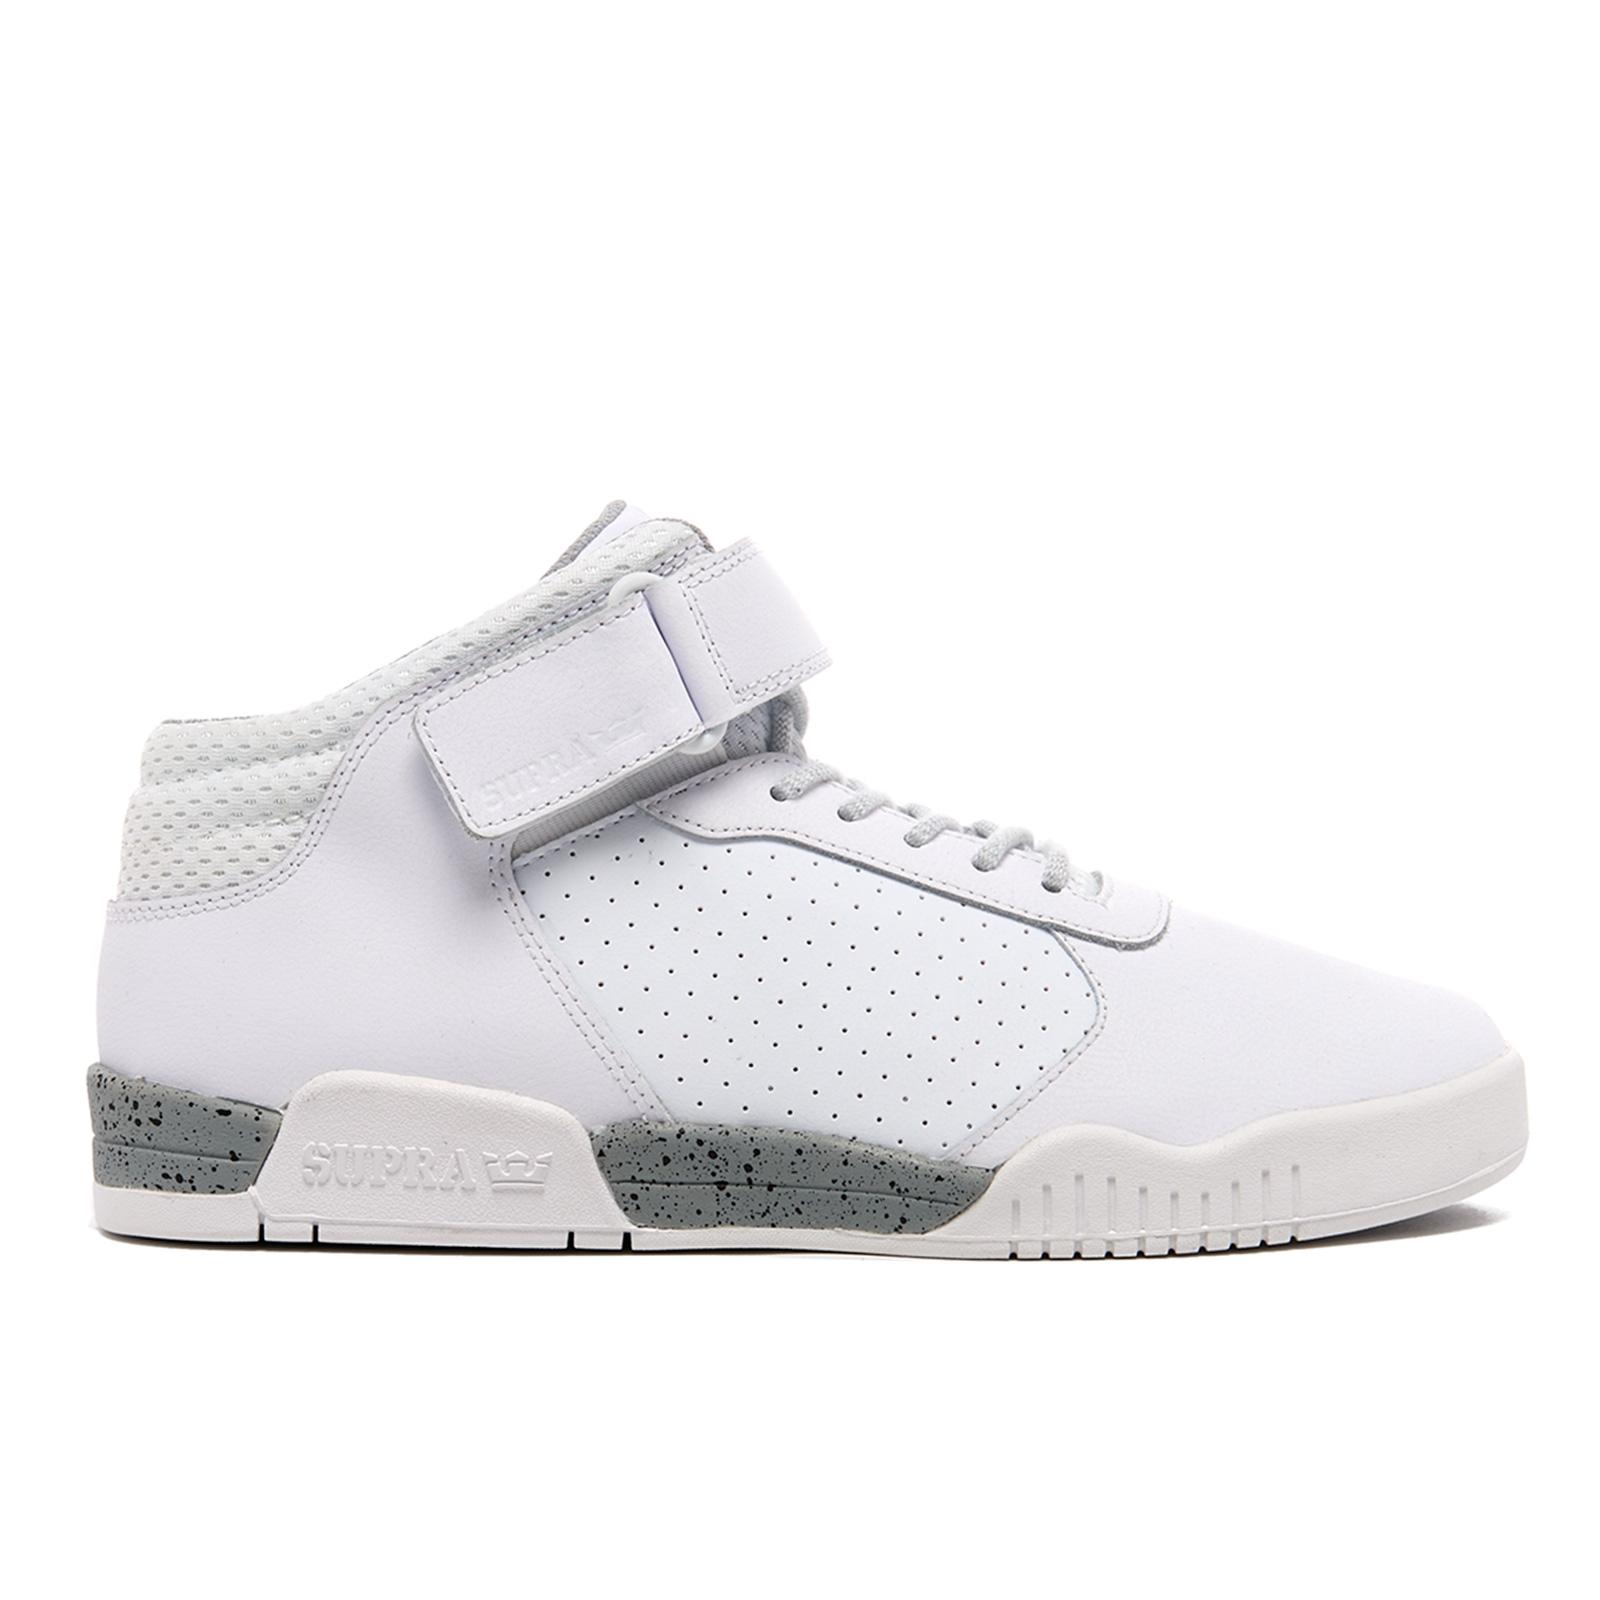 buy popular e6f26 dd47d Baskets Ellington Strap Mid Top Supra -Blanc Mens Footwear   fr.zavvi